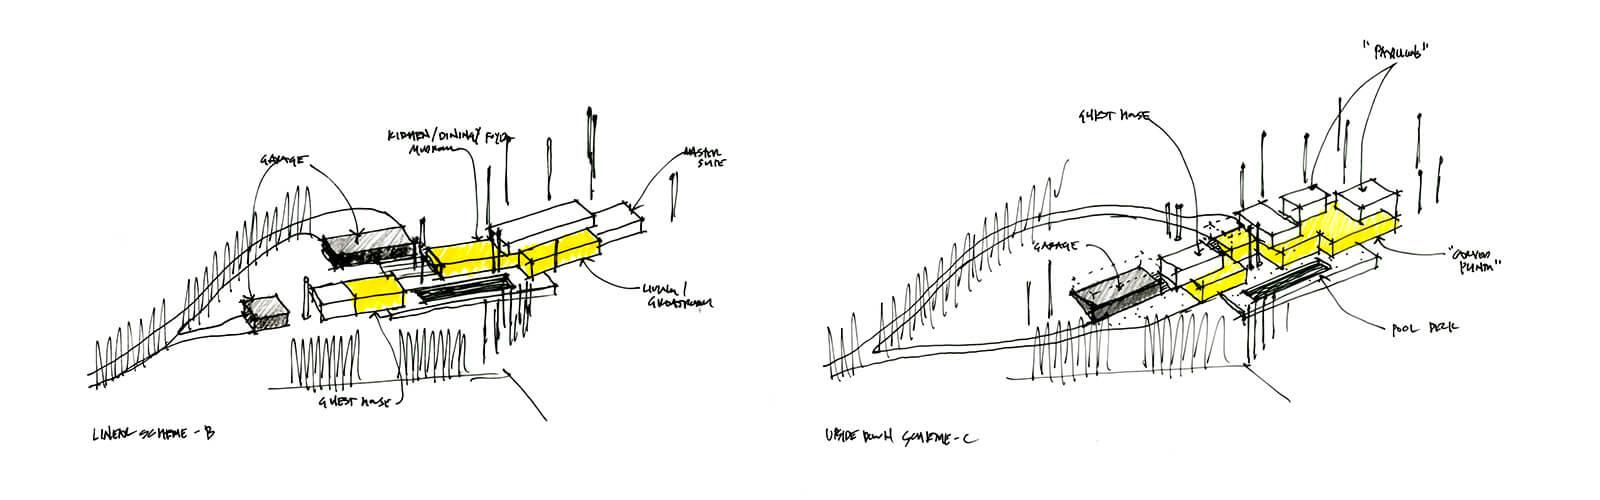 studio vara residential woodside i diagram massing